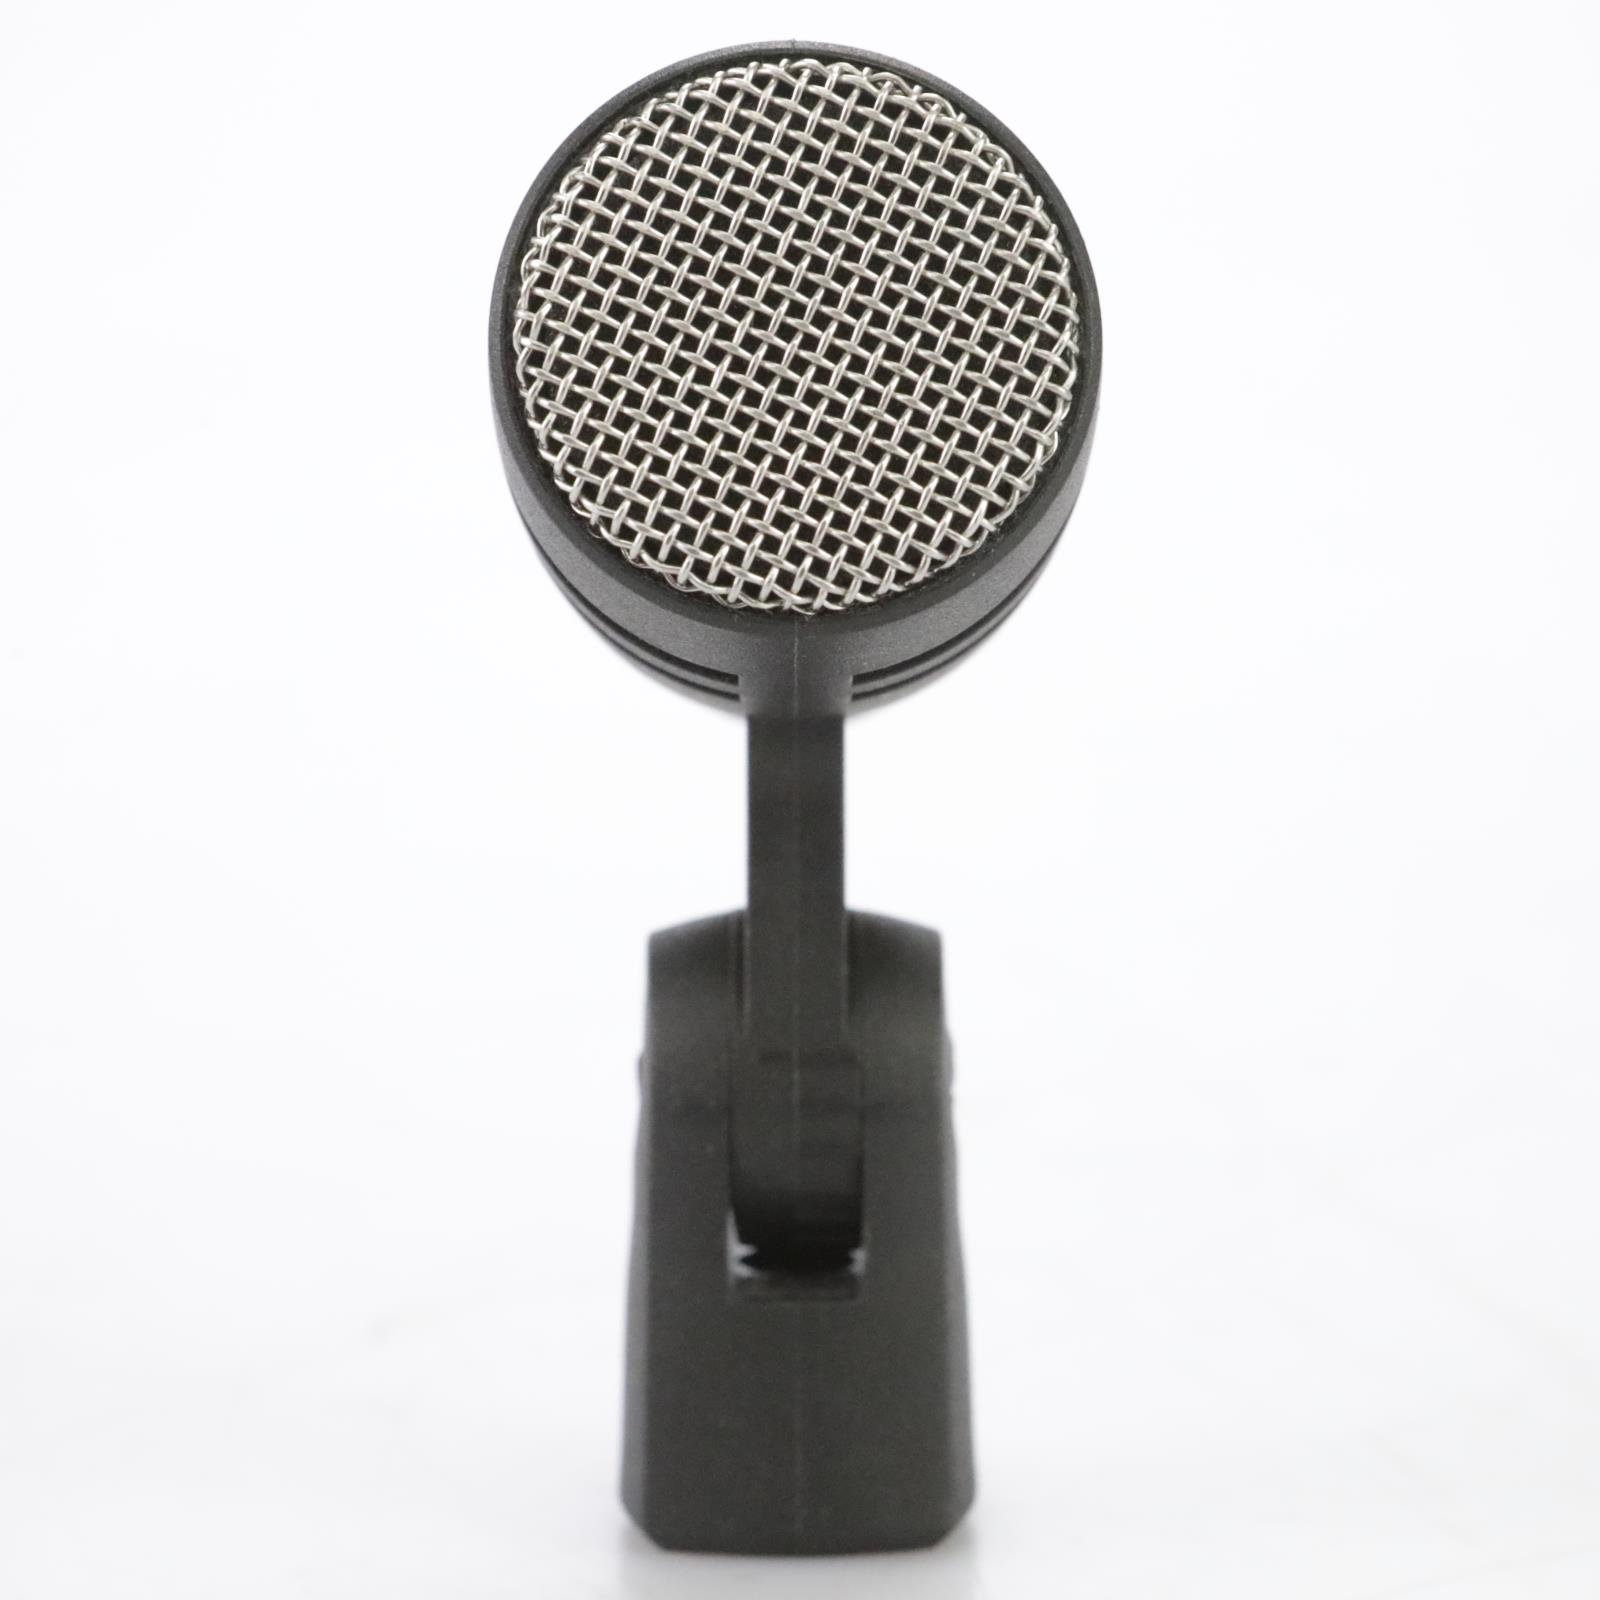 Sennheiser MD504 Dynamic Microphone w/ Case Owned By David Roback #44804